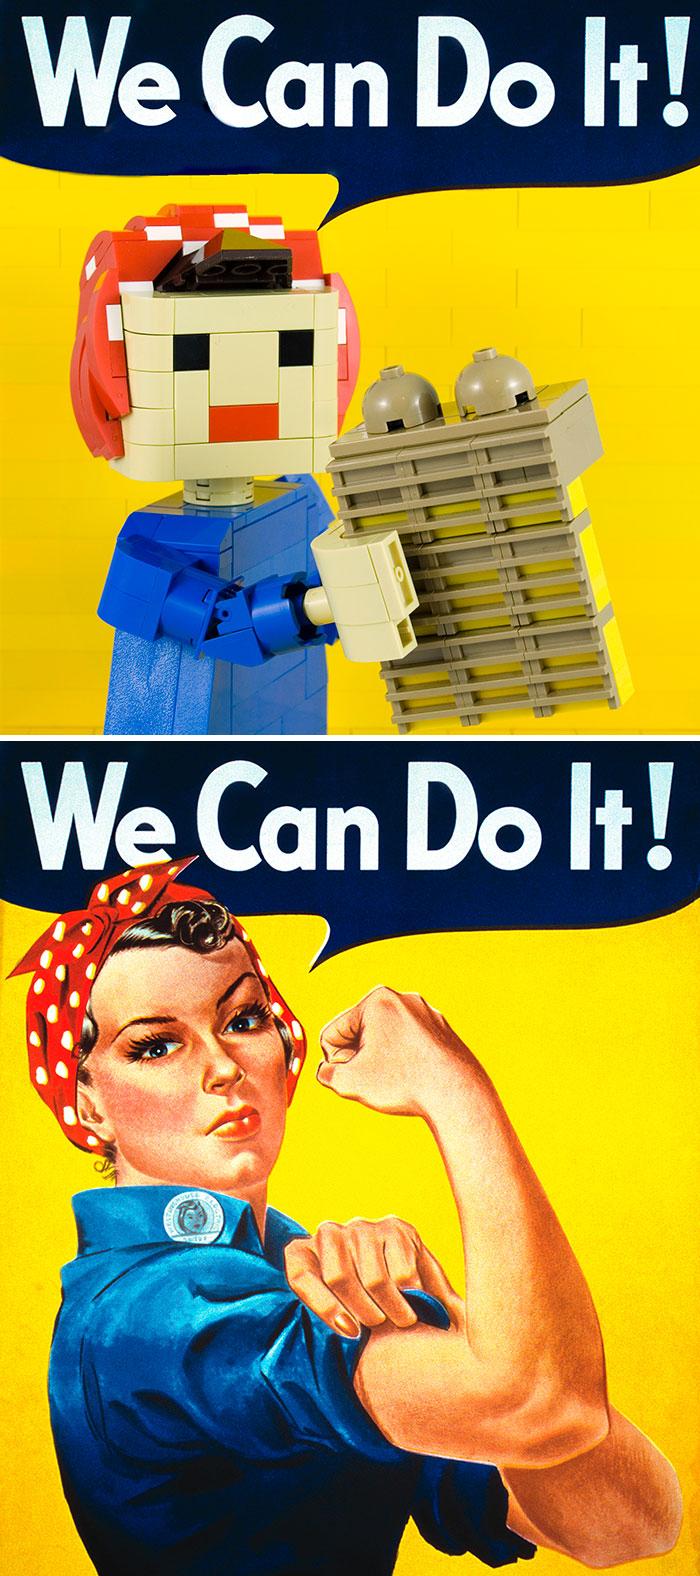 J. Howard Miller's We Can Do It